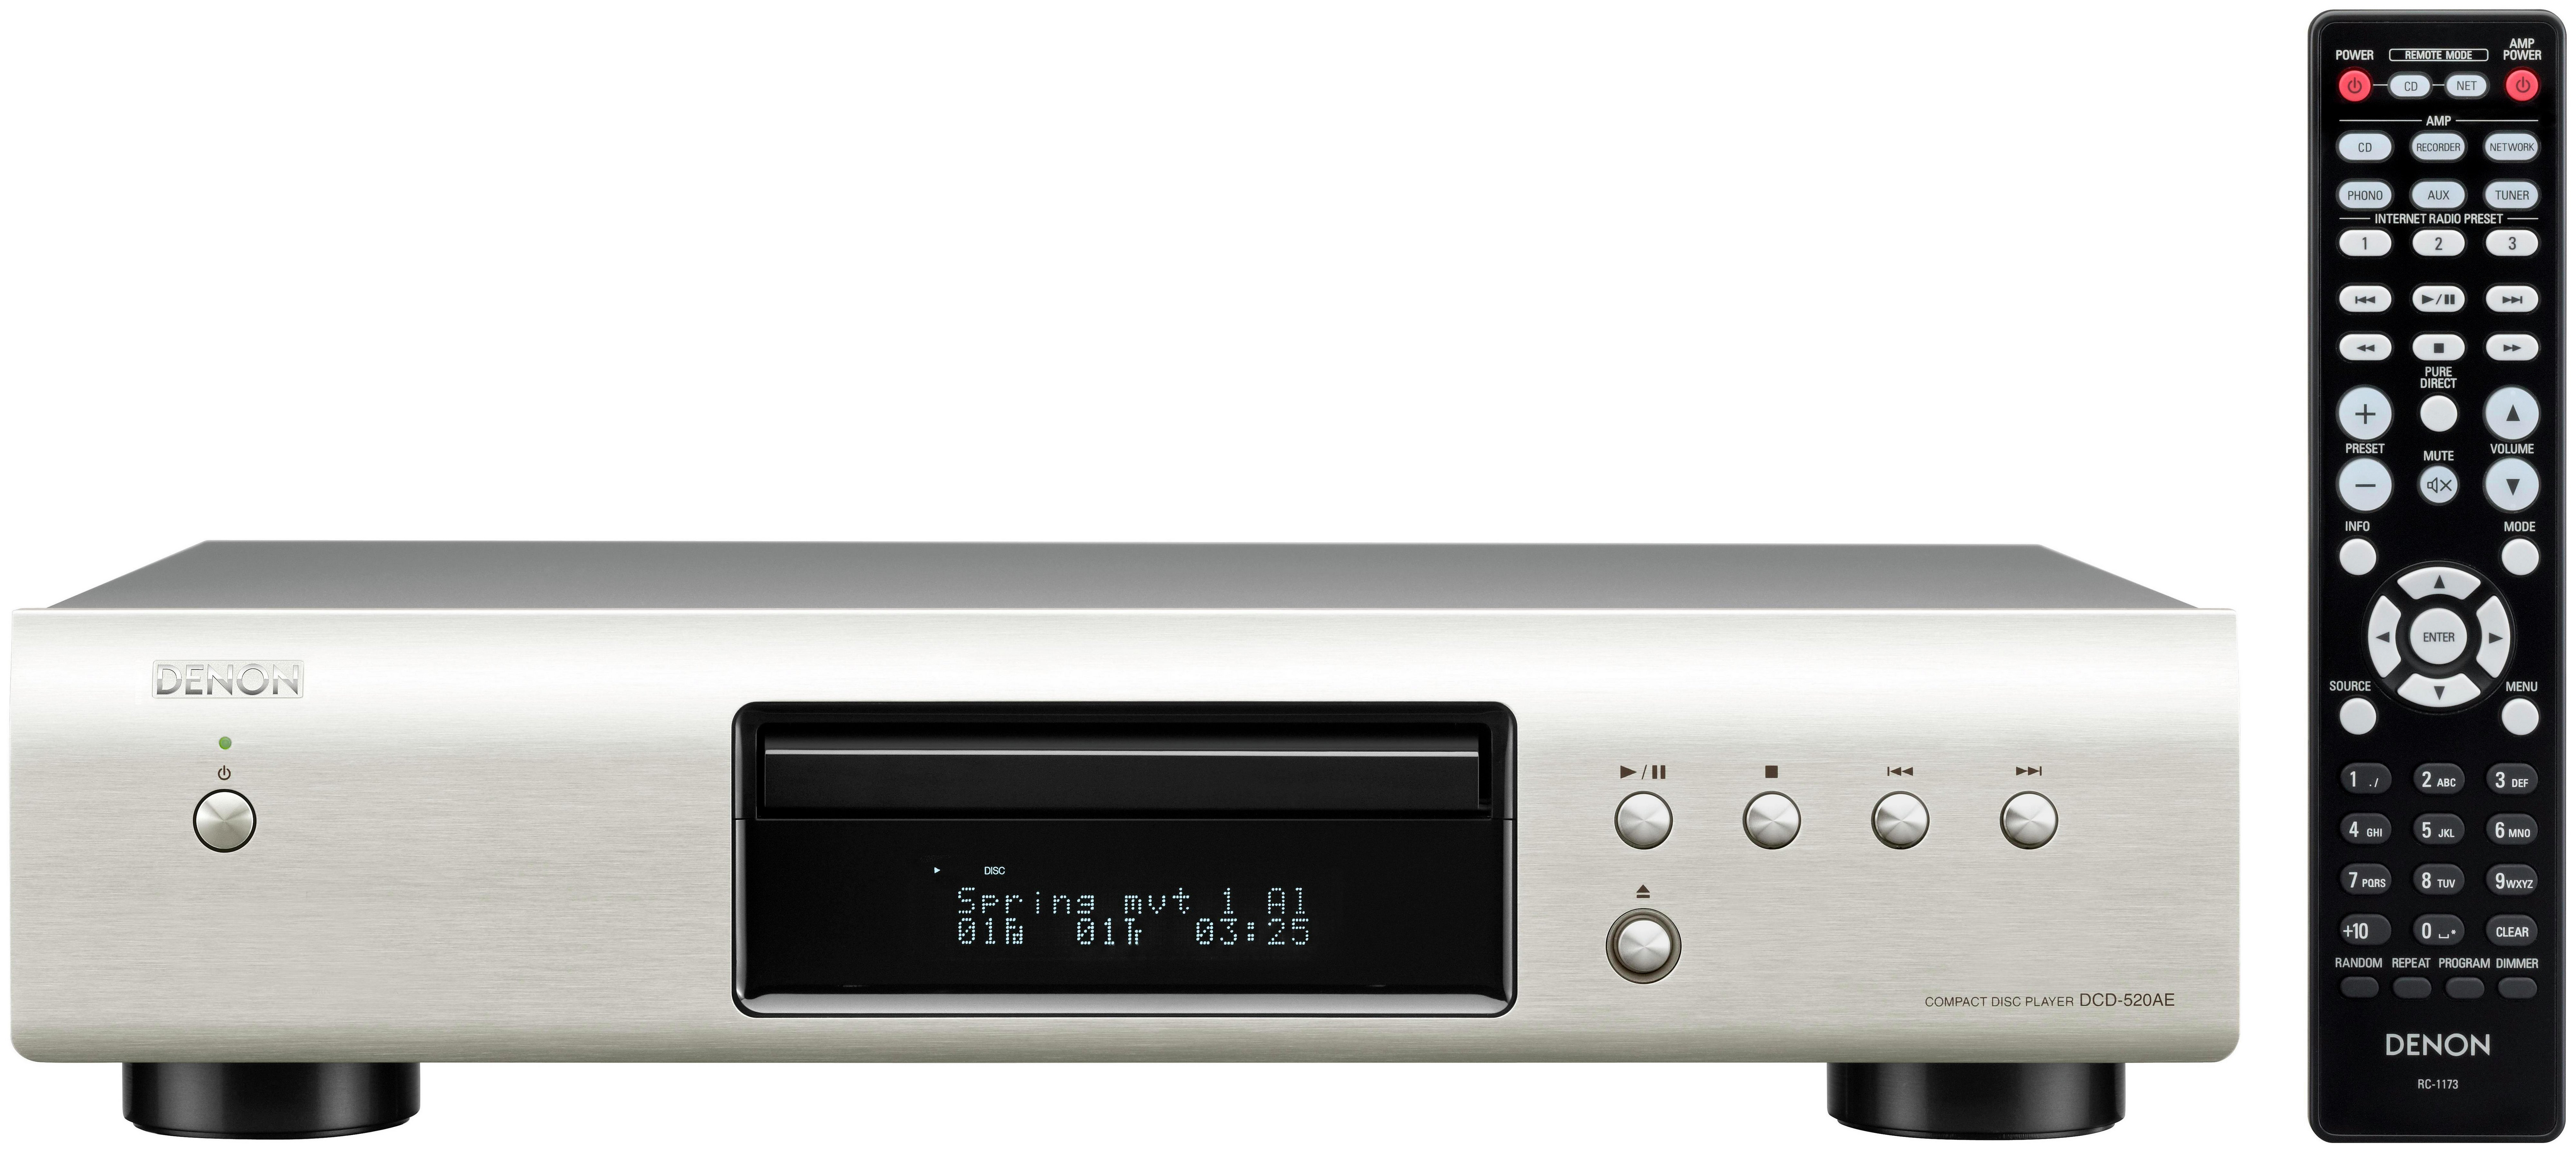 Image of Denon 520 CD Player - Silver.